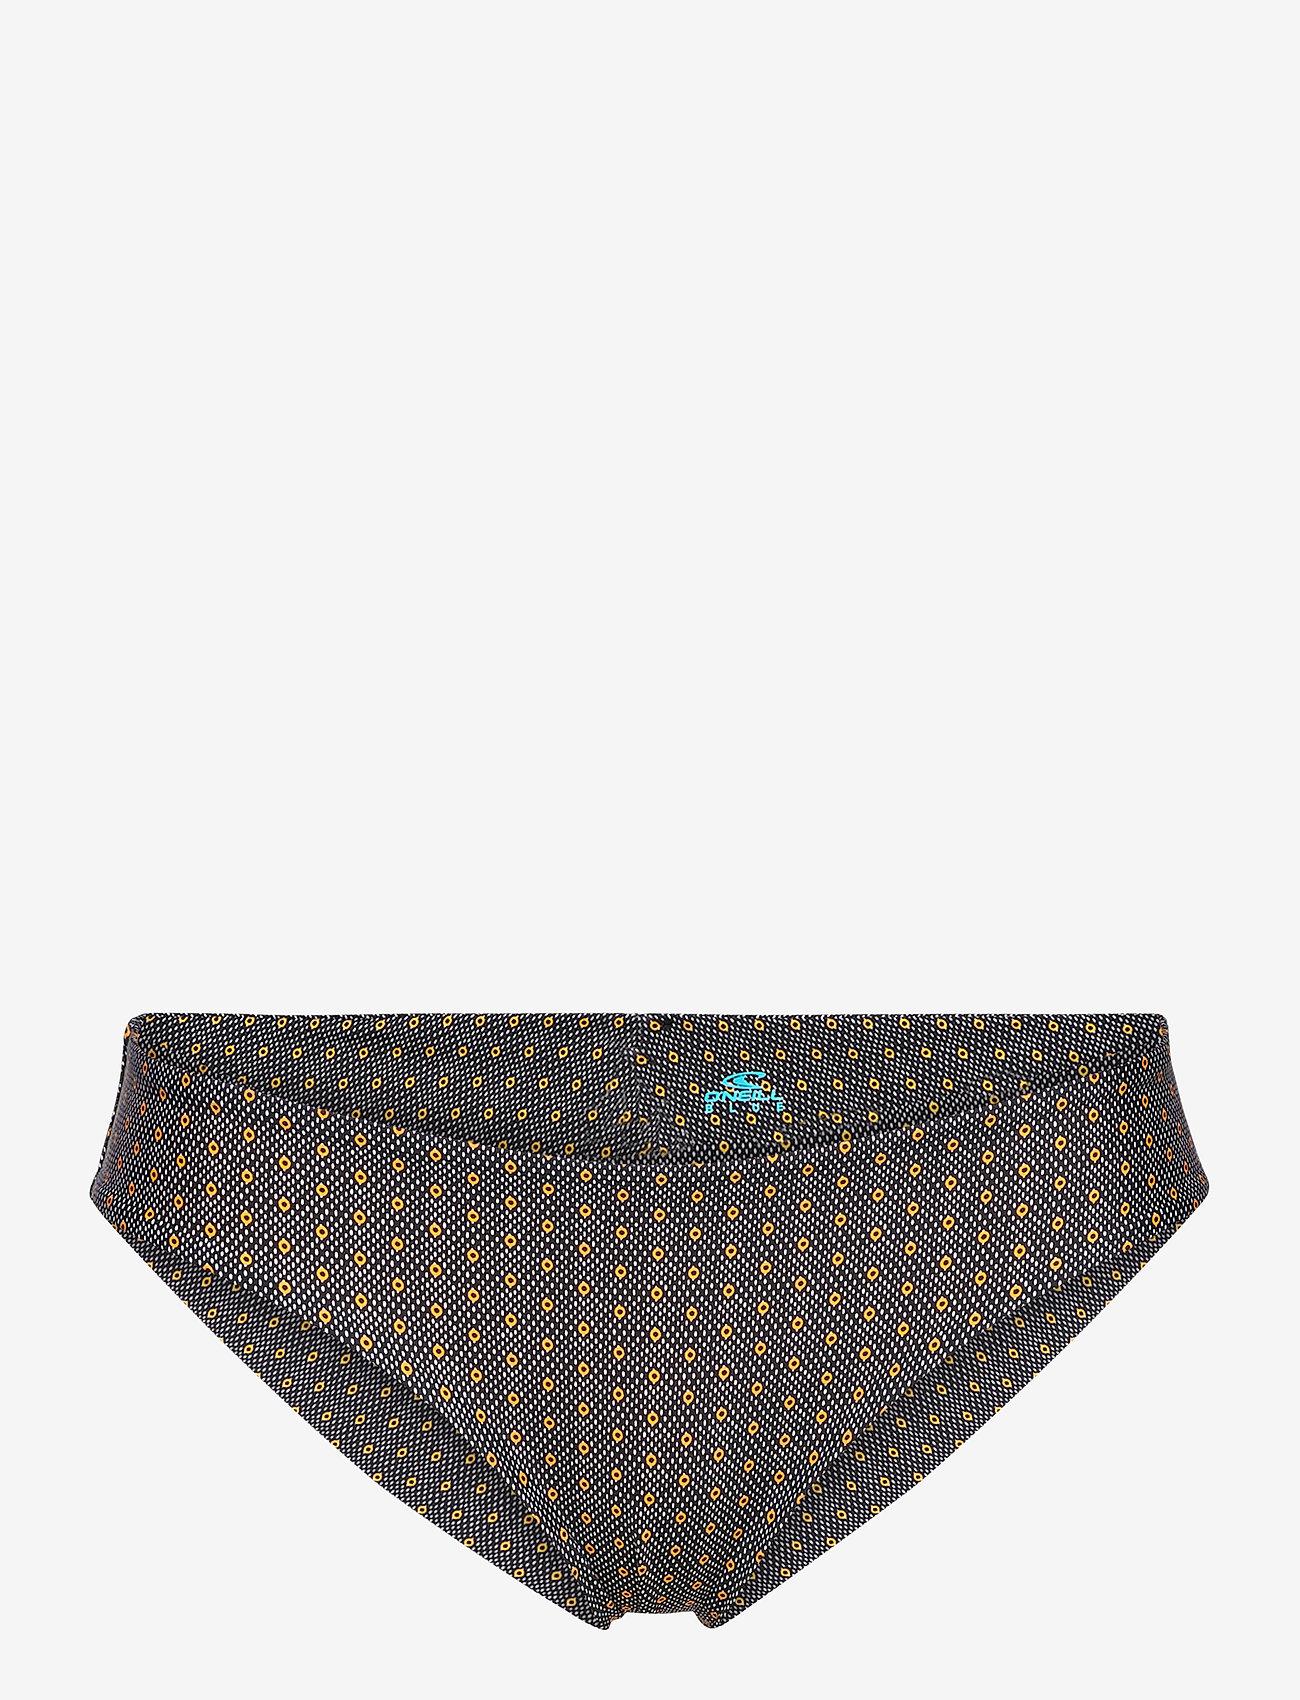 O'neill - PW MAOI  BOTTOM - majtki bikini - black aop w/ yellow - 0